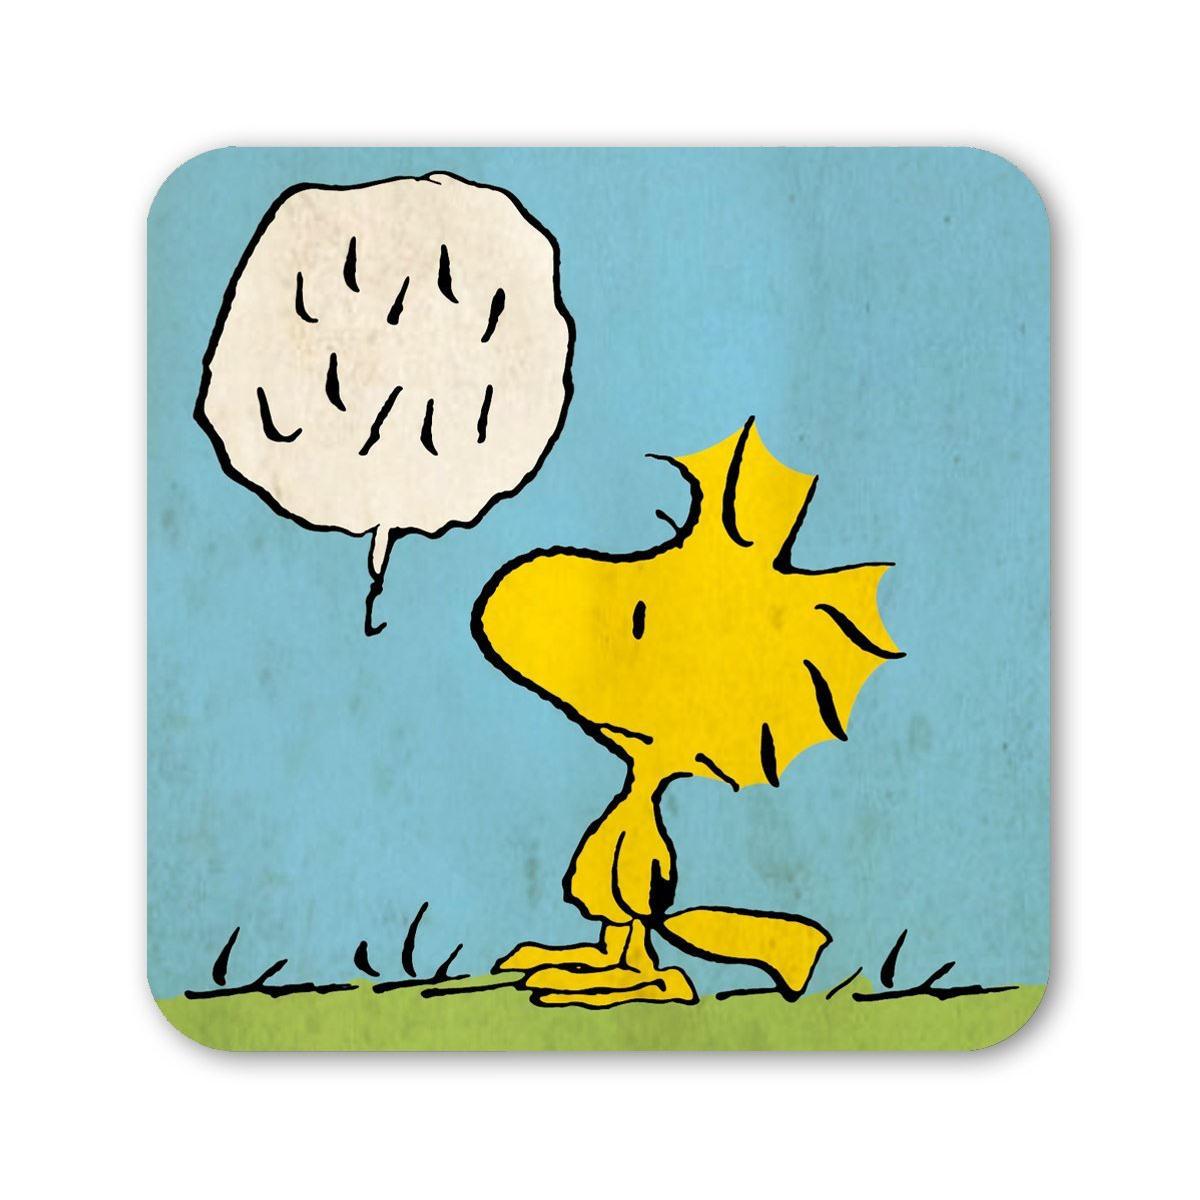 Woodstock Coaster Retro Drinks Mat Gift Peanuts Snoopy Dog